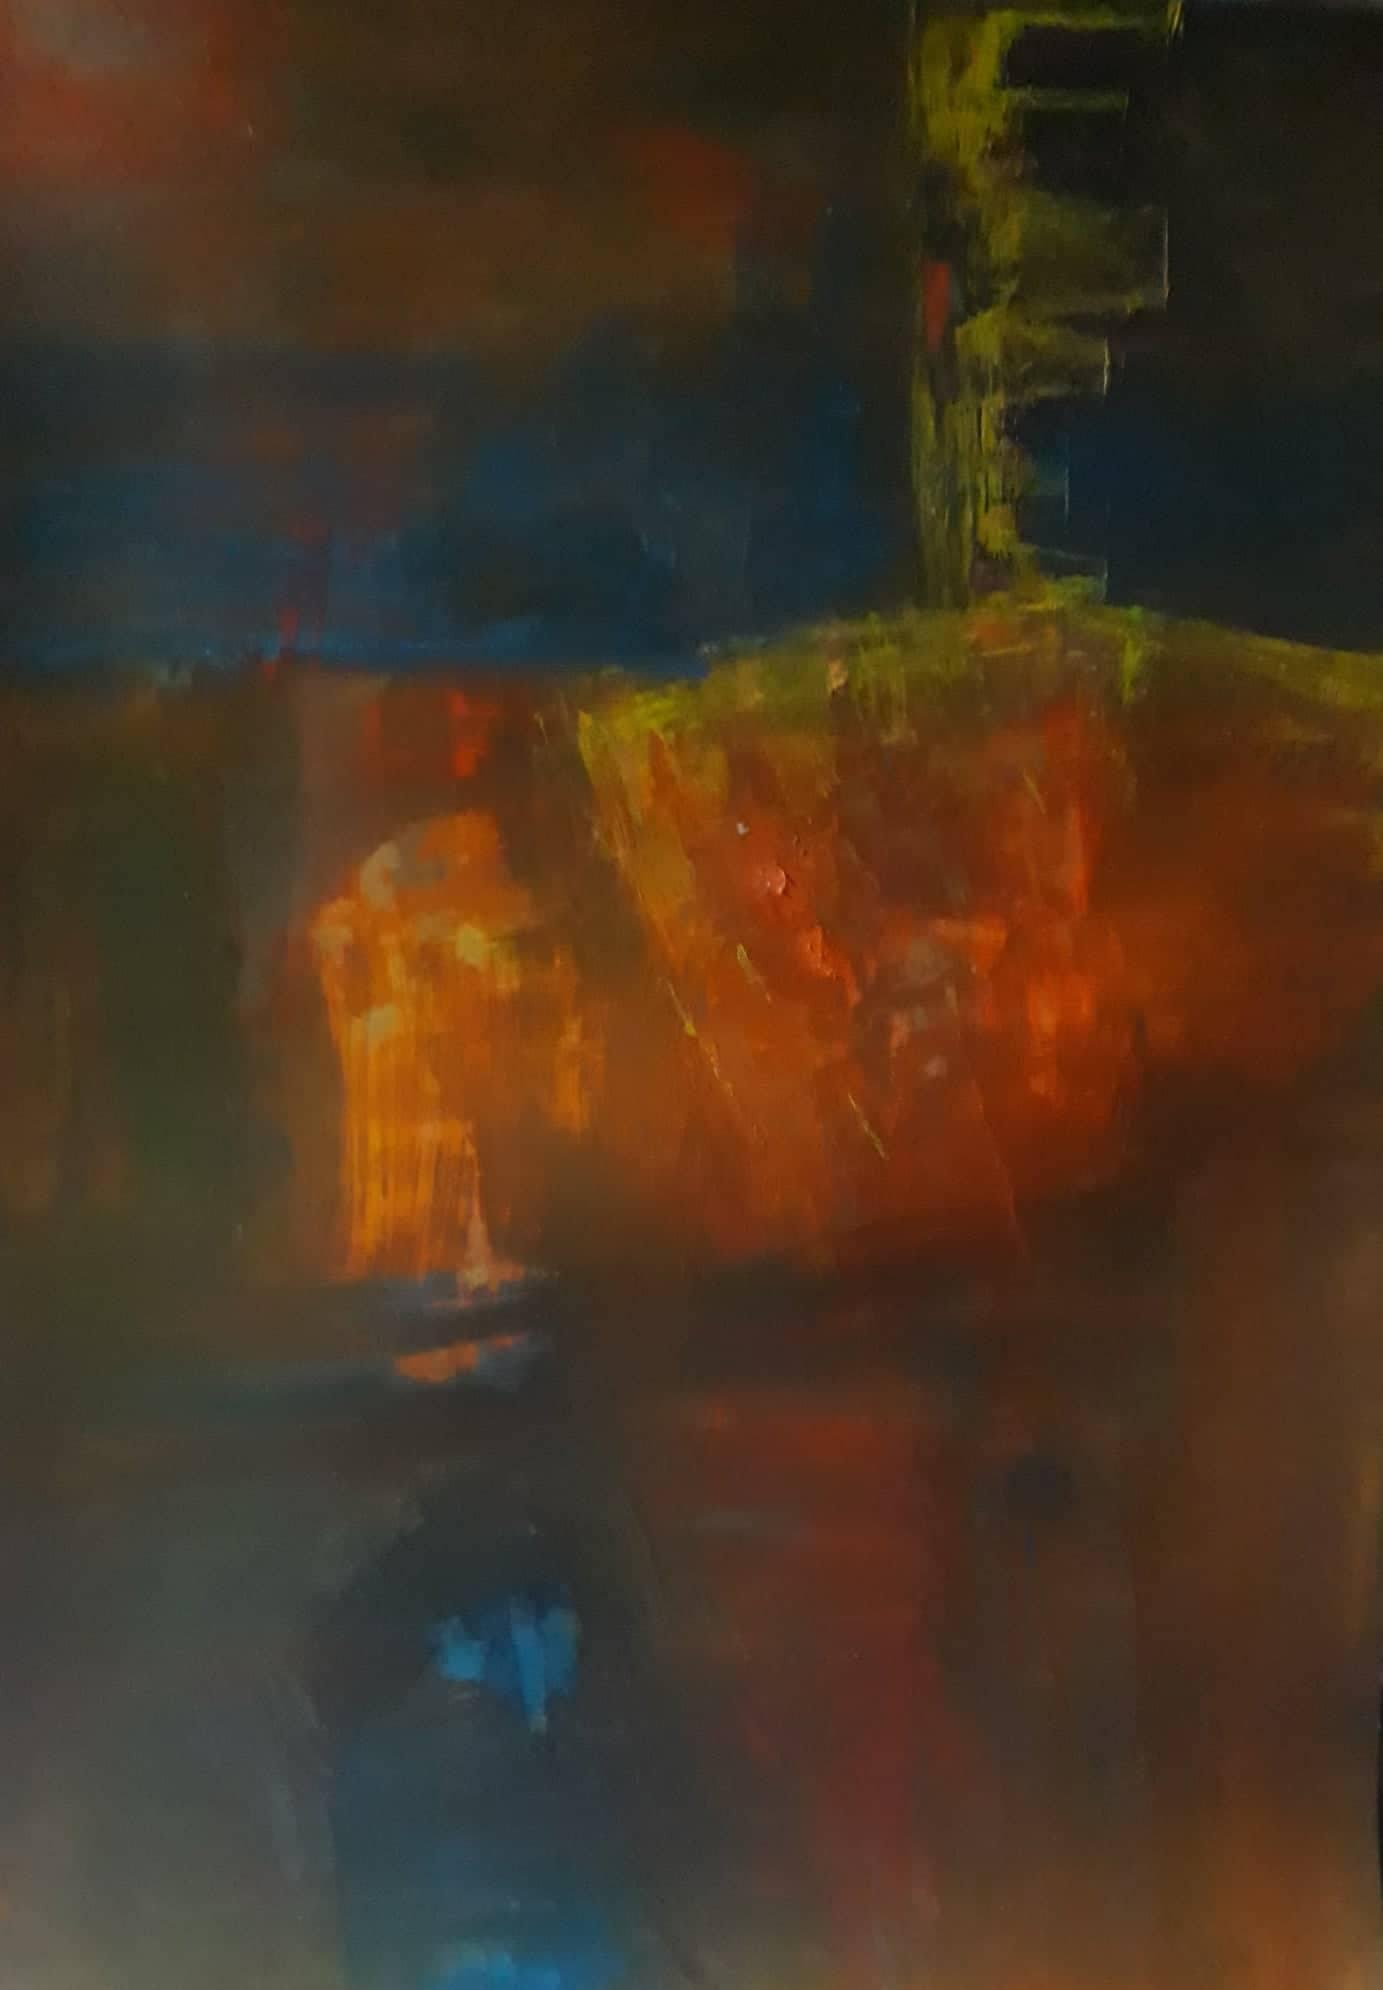 Lust, dipinto di Somnath Basuthakur